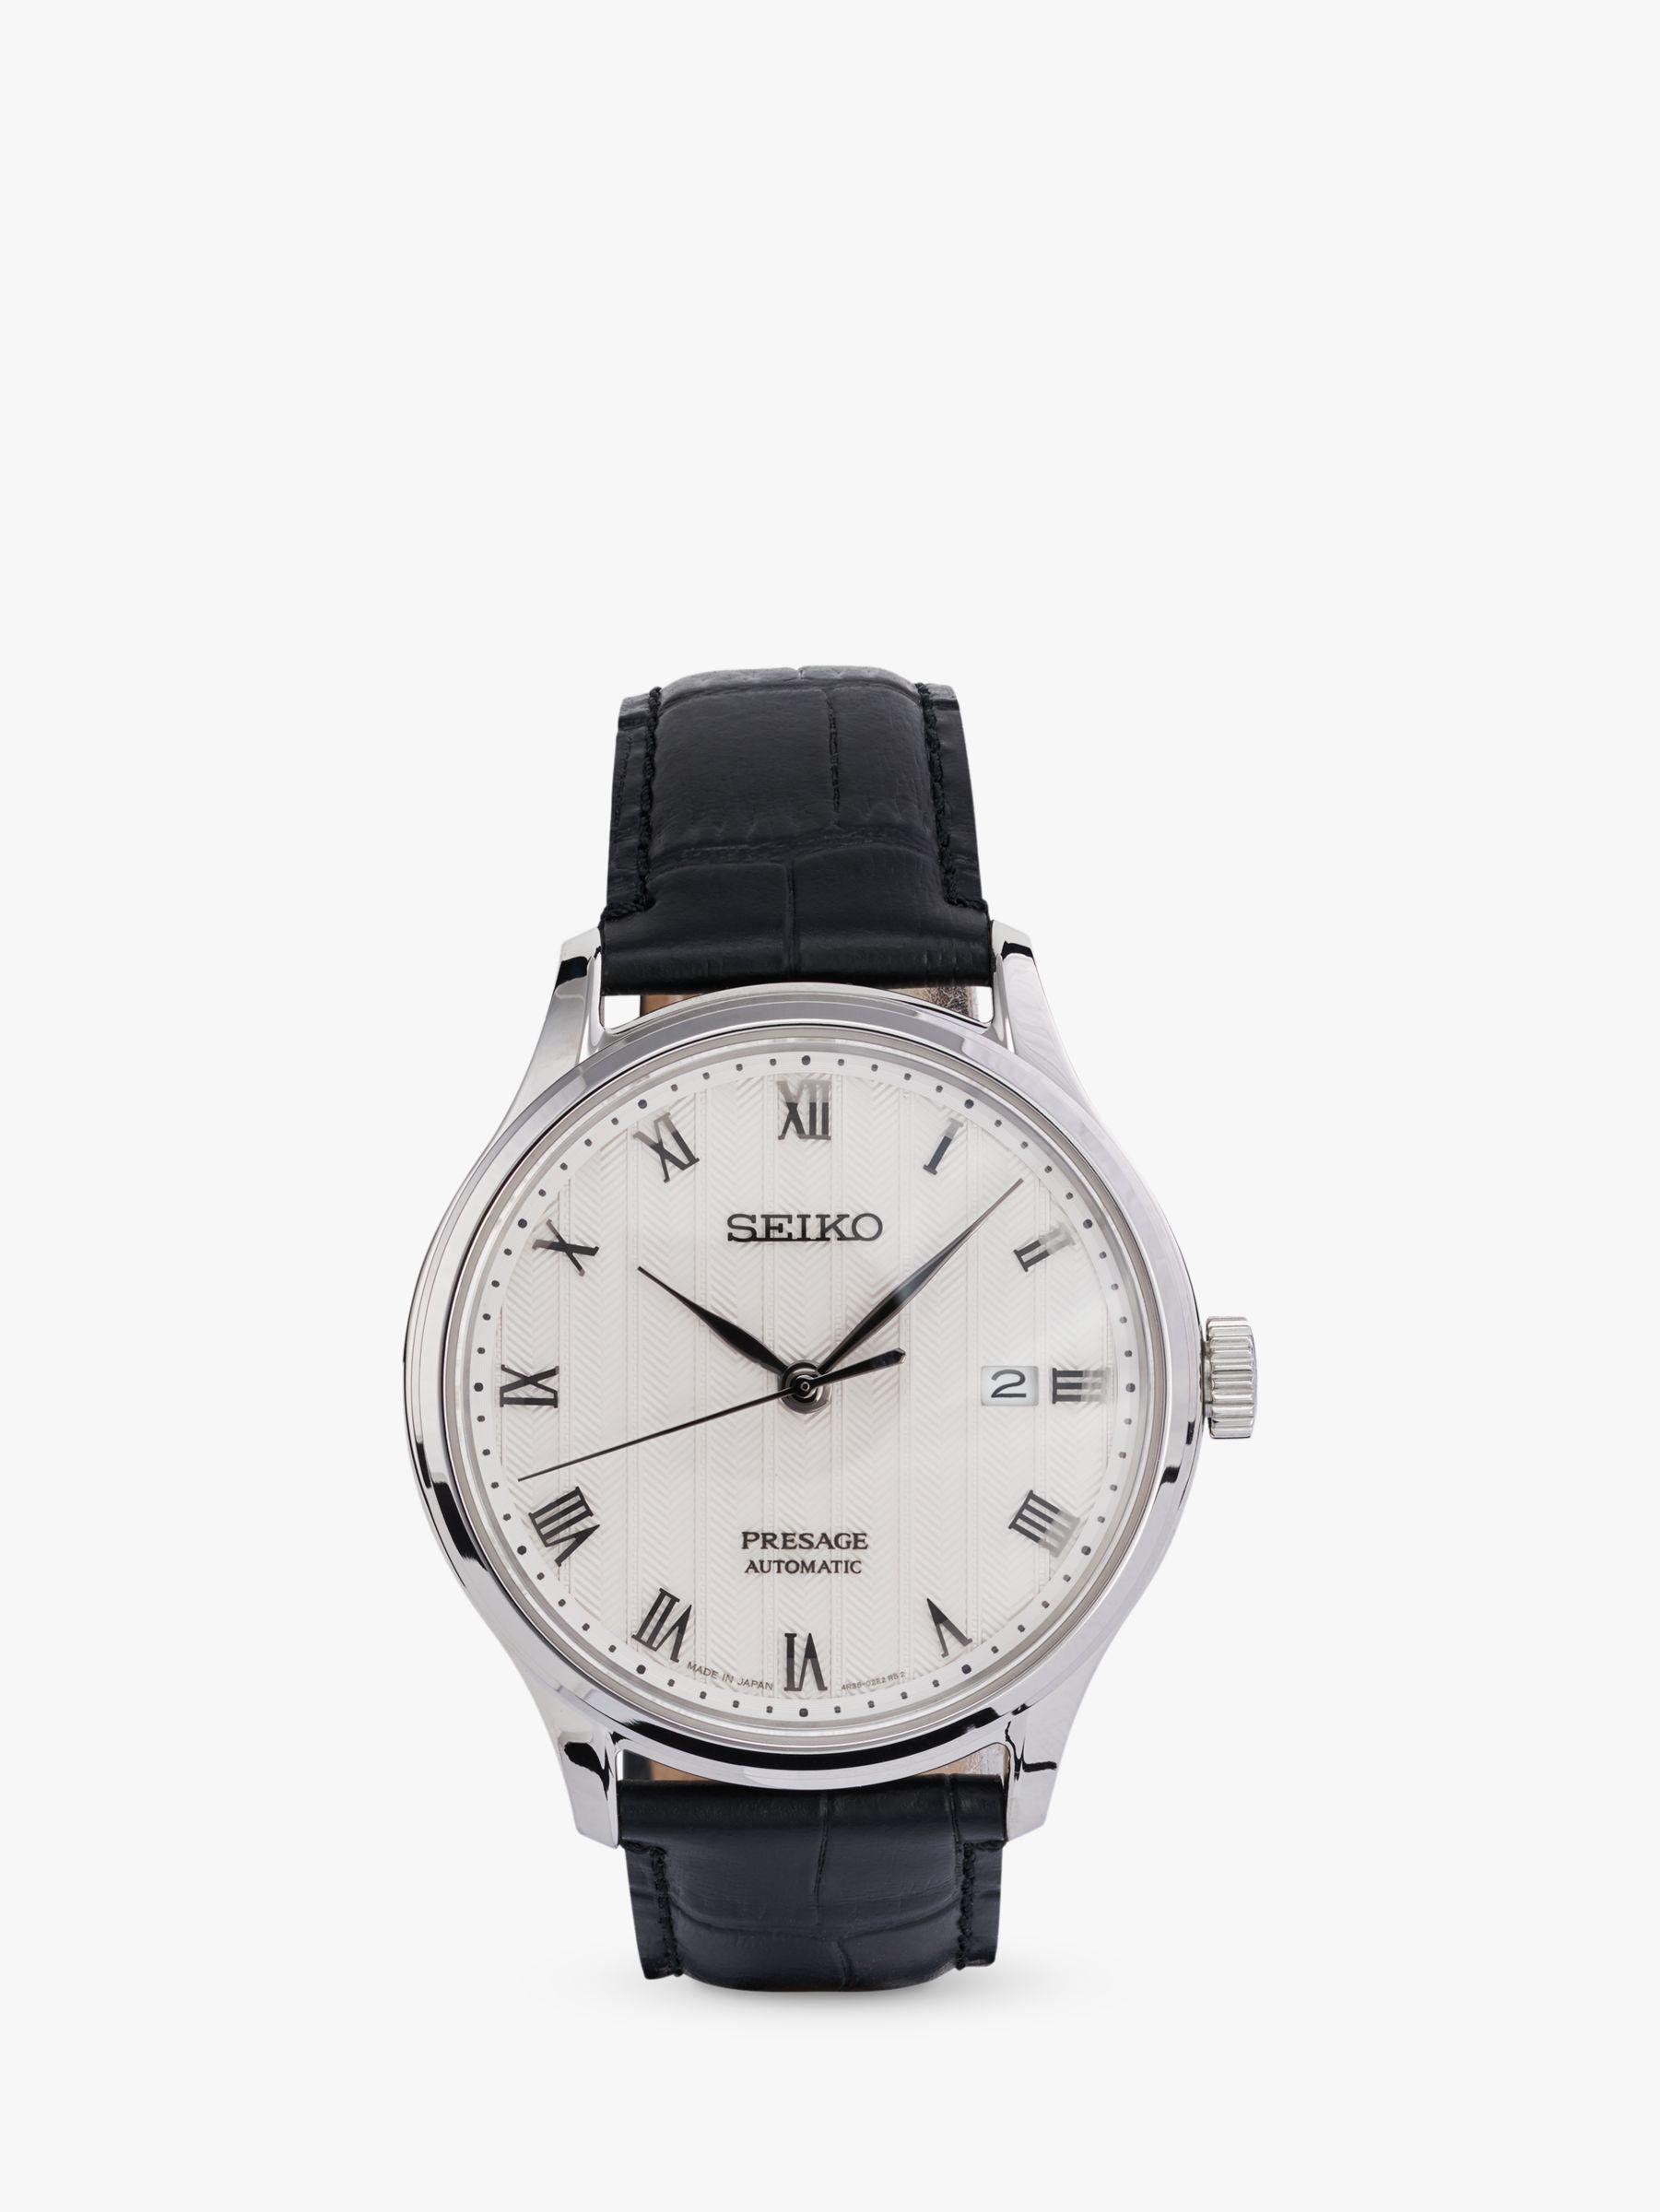 Seiko Seiko SRPC83J1 Men's Presage Automatic Date Leather Strap Watch, Black/White